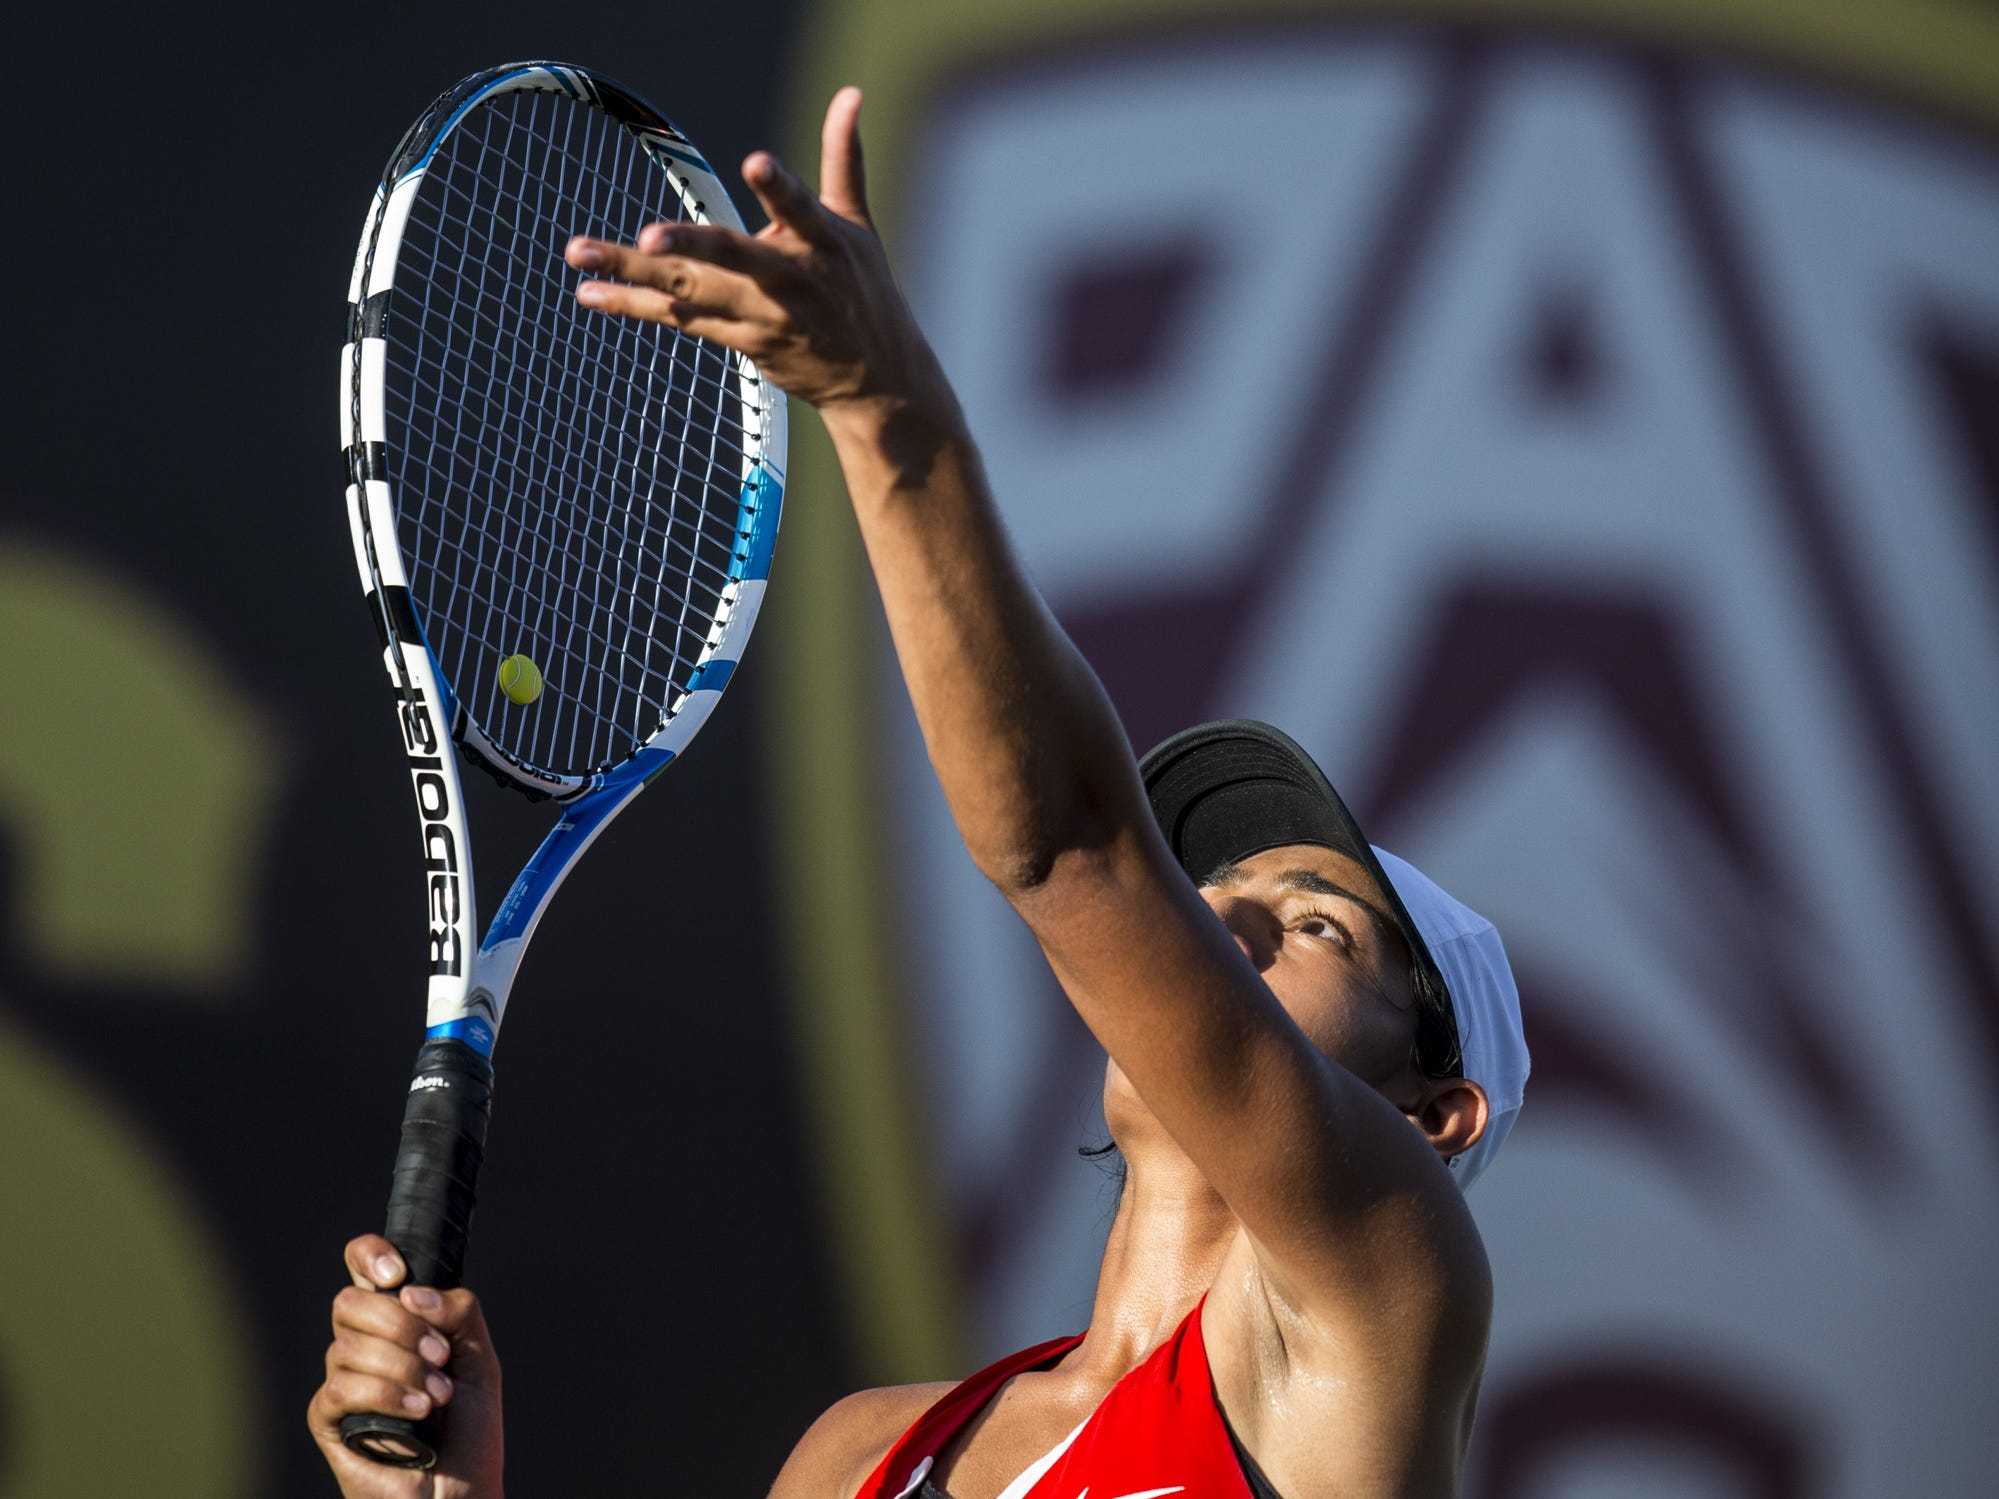 Chandler Prep's Sangeet Bhalla serves against Pusch Ridge's Sofia Fetsis during the Division III Girls Tennis Singles State Championship on Monday, April 29, 2019, at Whiteman Tennis Center in Tempe, Ariz.